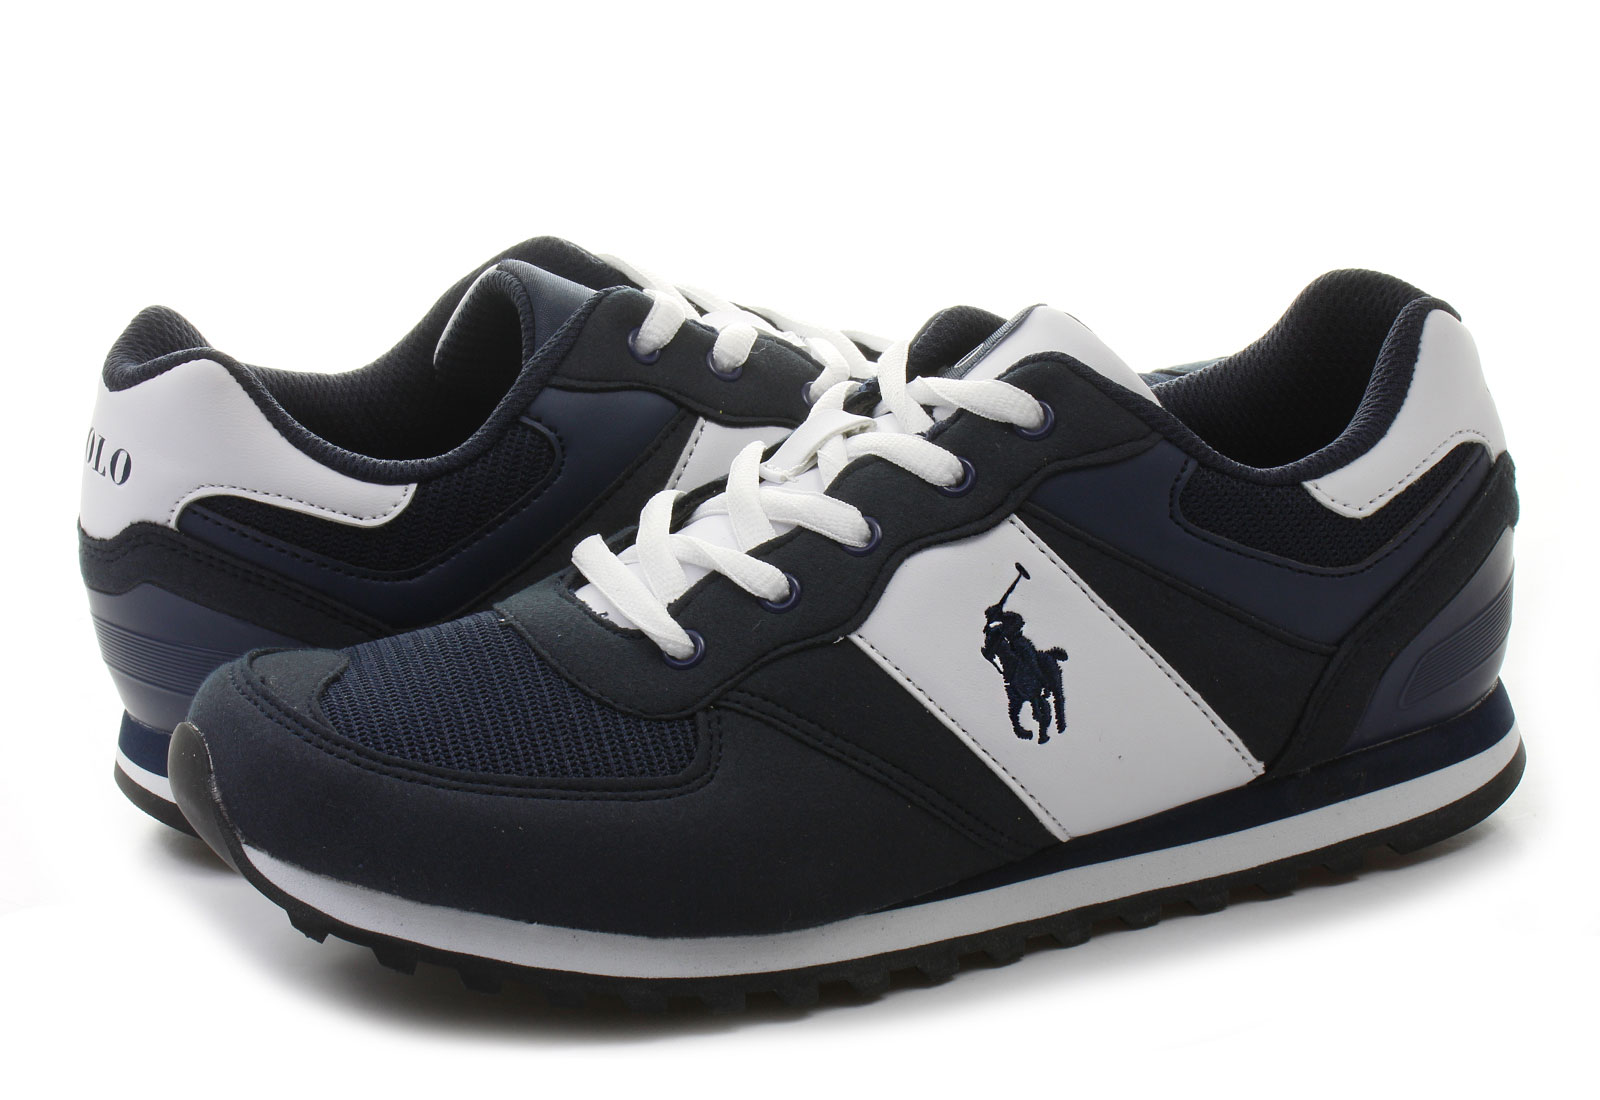 e88aef48 Polo Ralph Lauren Shoes - Slaton - 992980-j-nvy - Online shop for ...